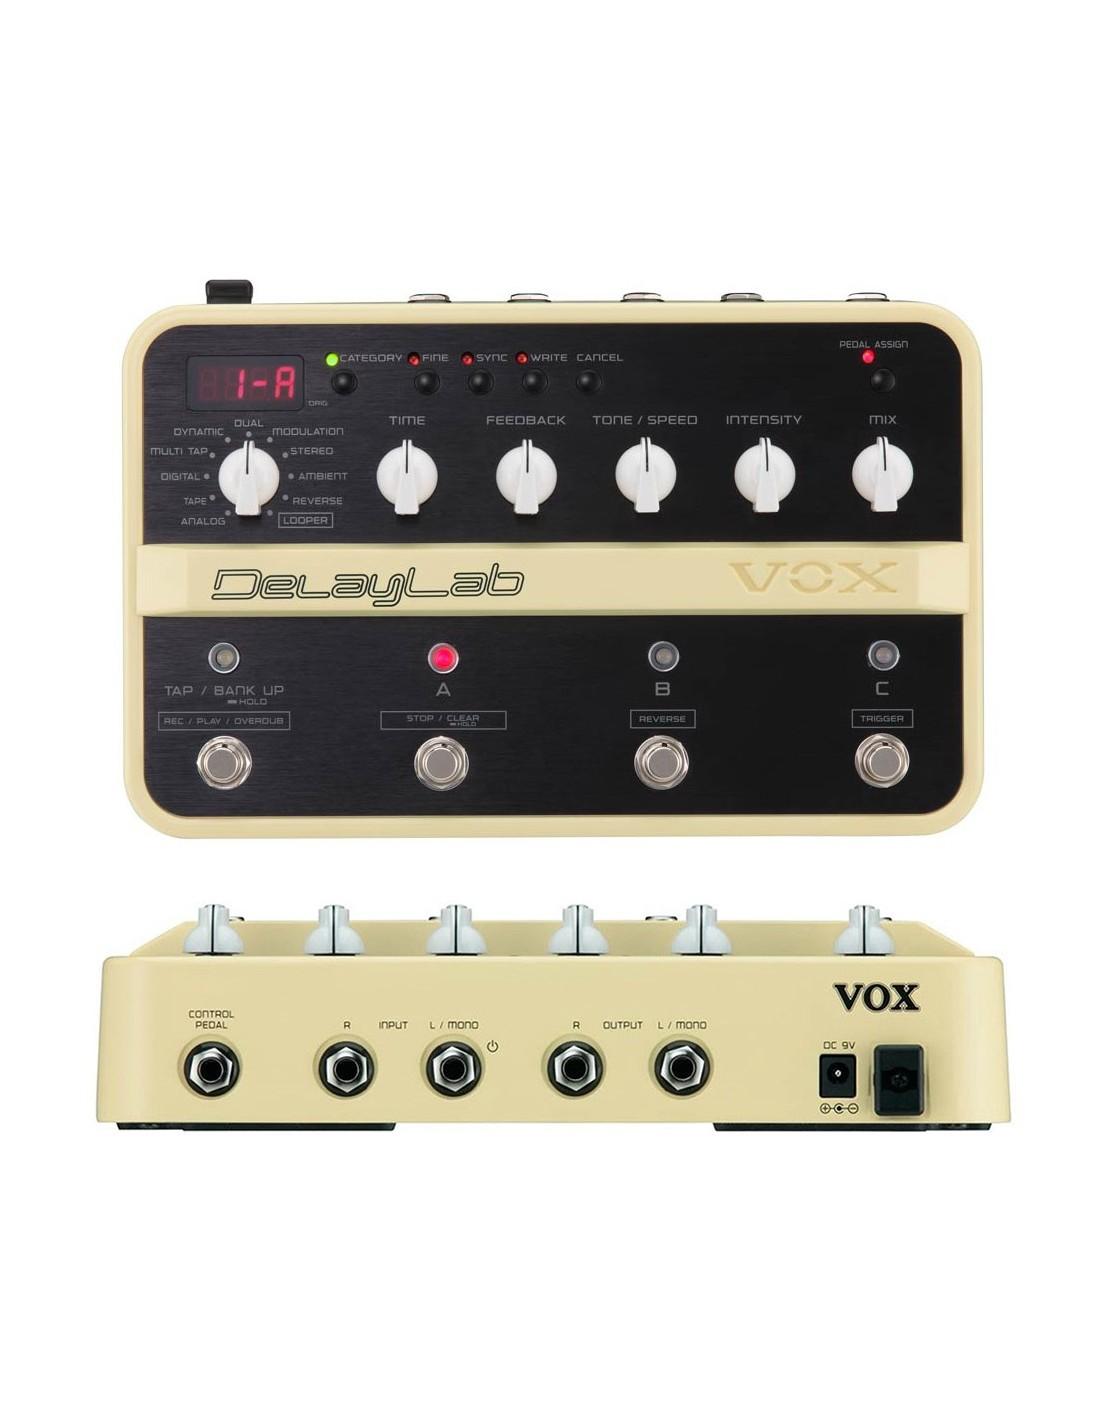 Guitar Effects Pedals For Sale Uk : vox delaylab guitar multi effects pedal re sale great condition ~ Russianpoet.info Haus und Dekorationen